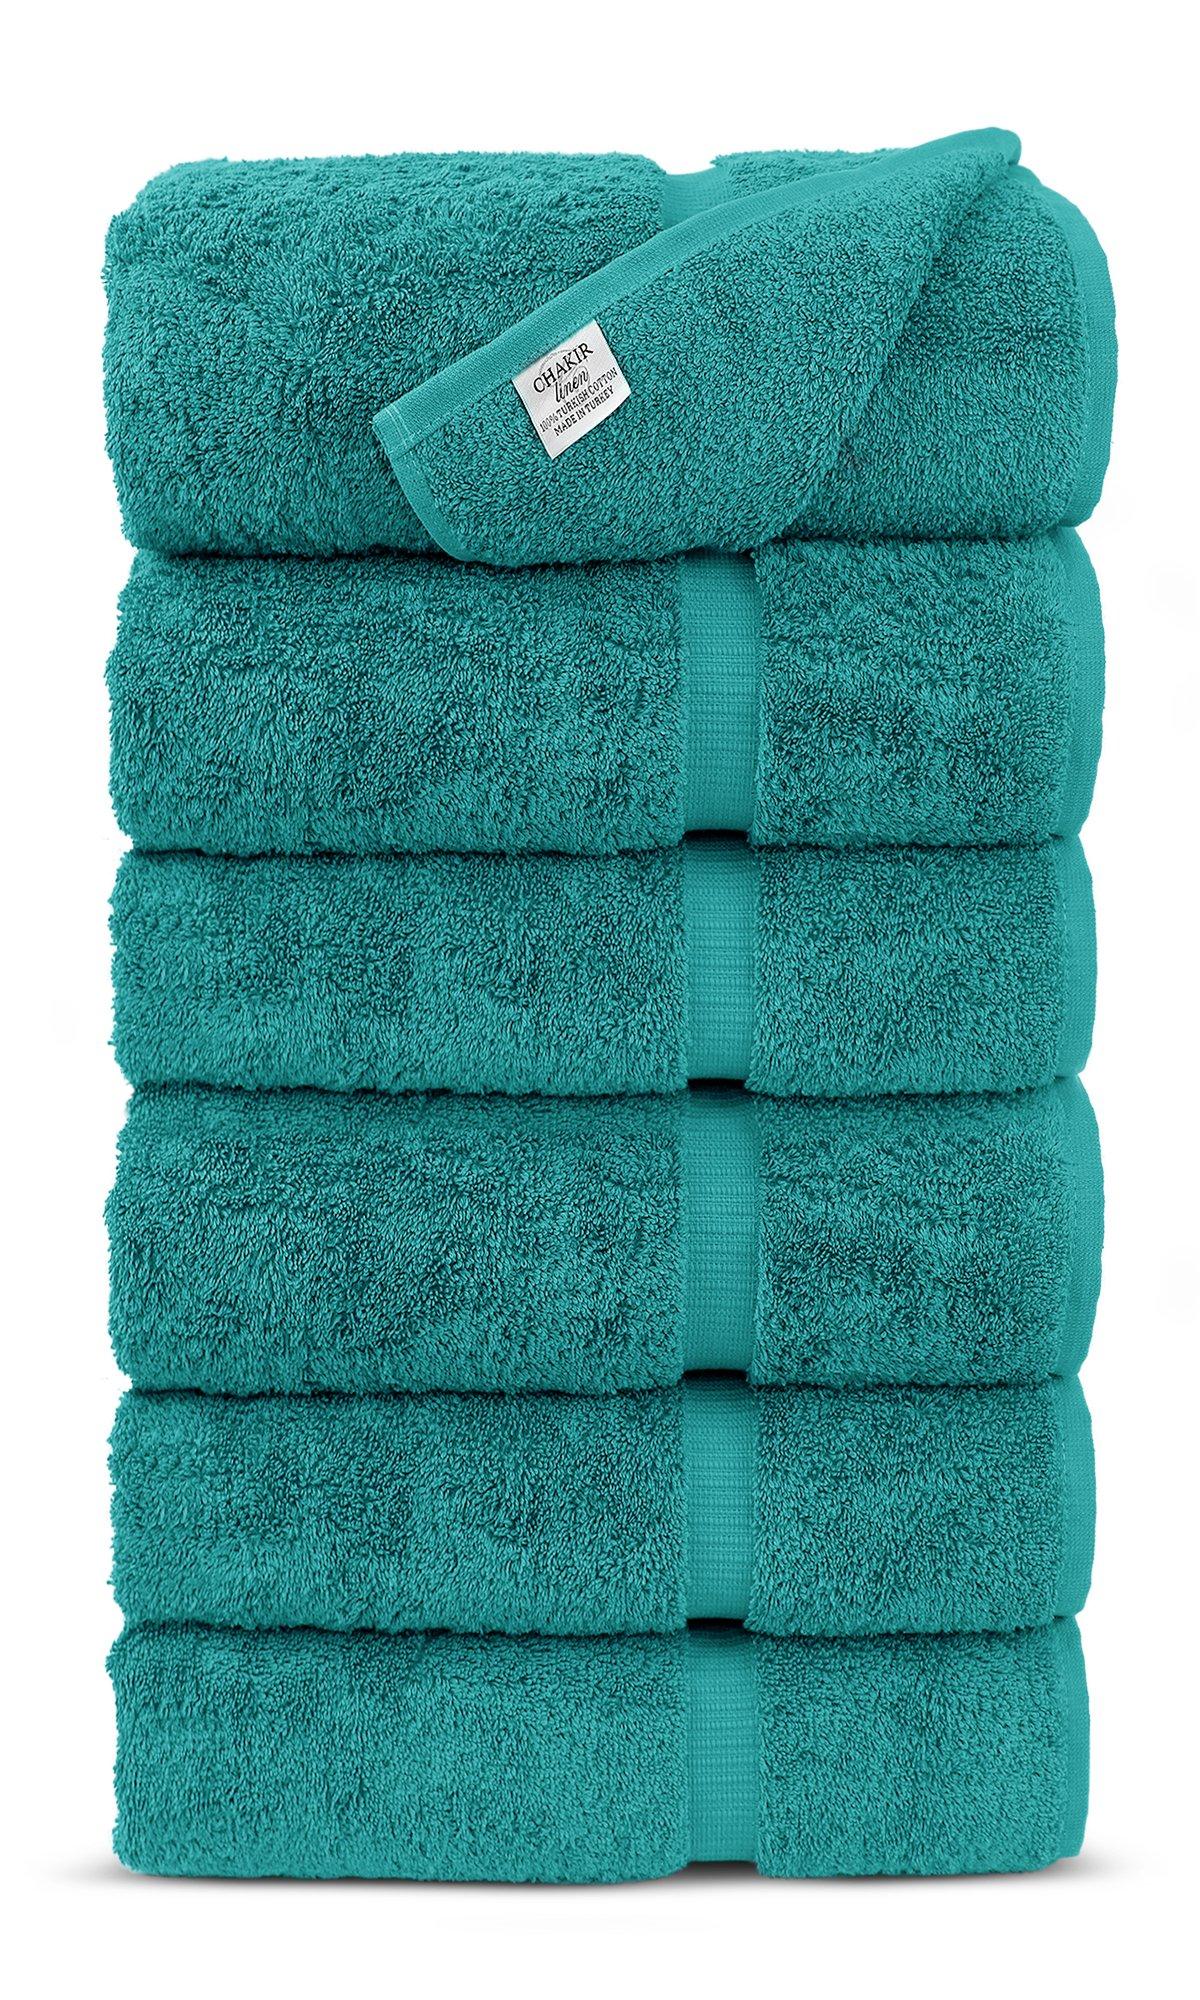 Luxury Premium long-stable Hotel & Spa Turkish Cotton 6-Piece Eco-Friendly Hand Towel Set (Aqua)